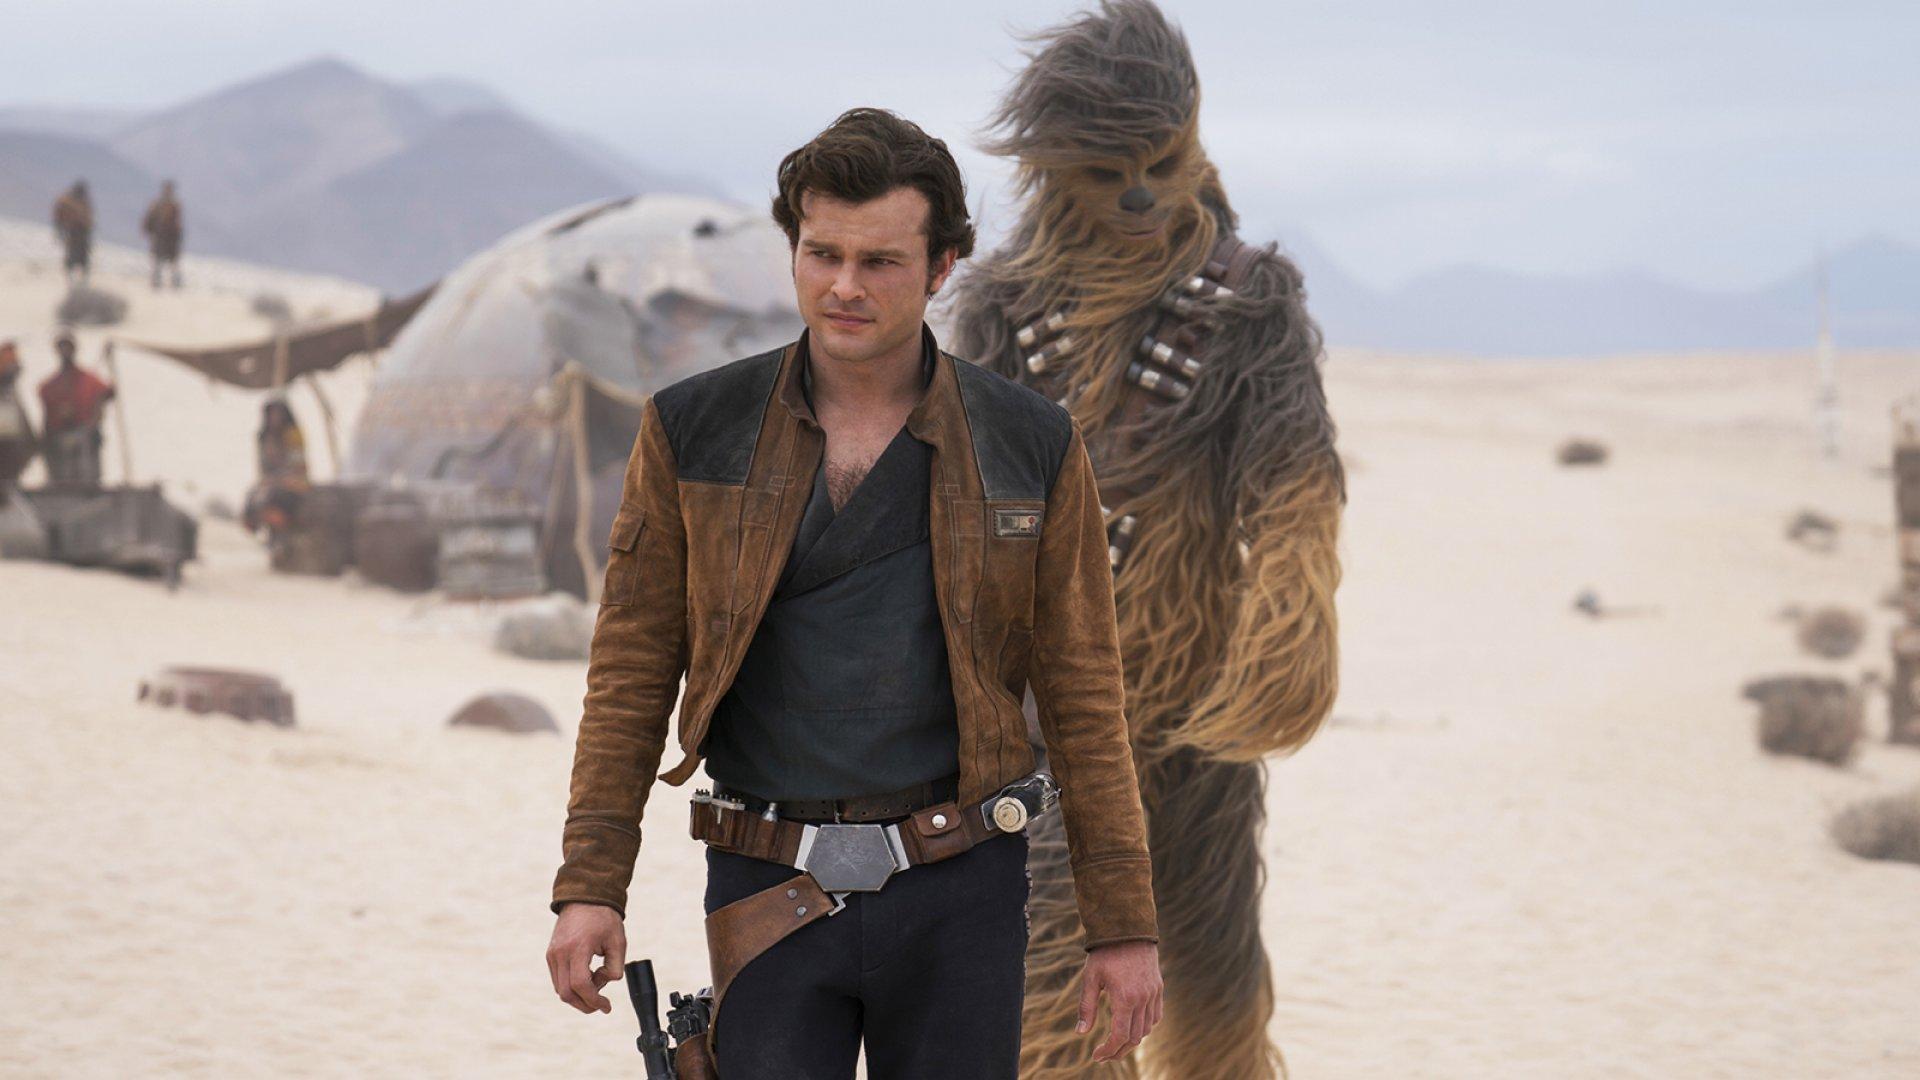 Still from <i>Solo: A Star Wars Story</i>.